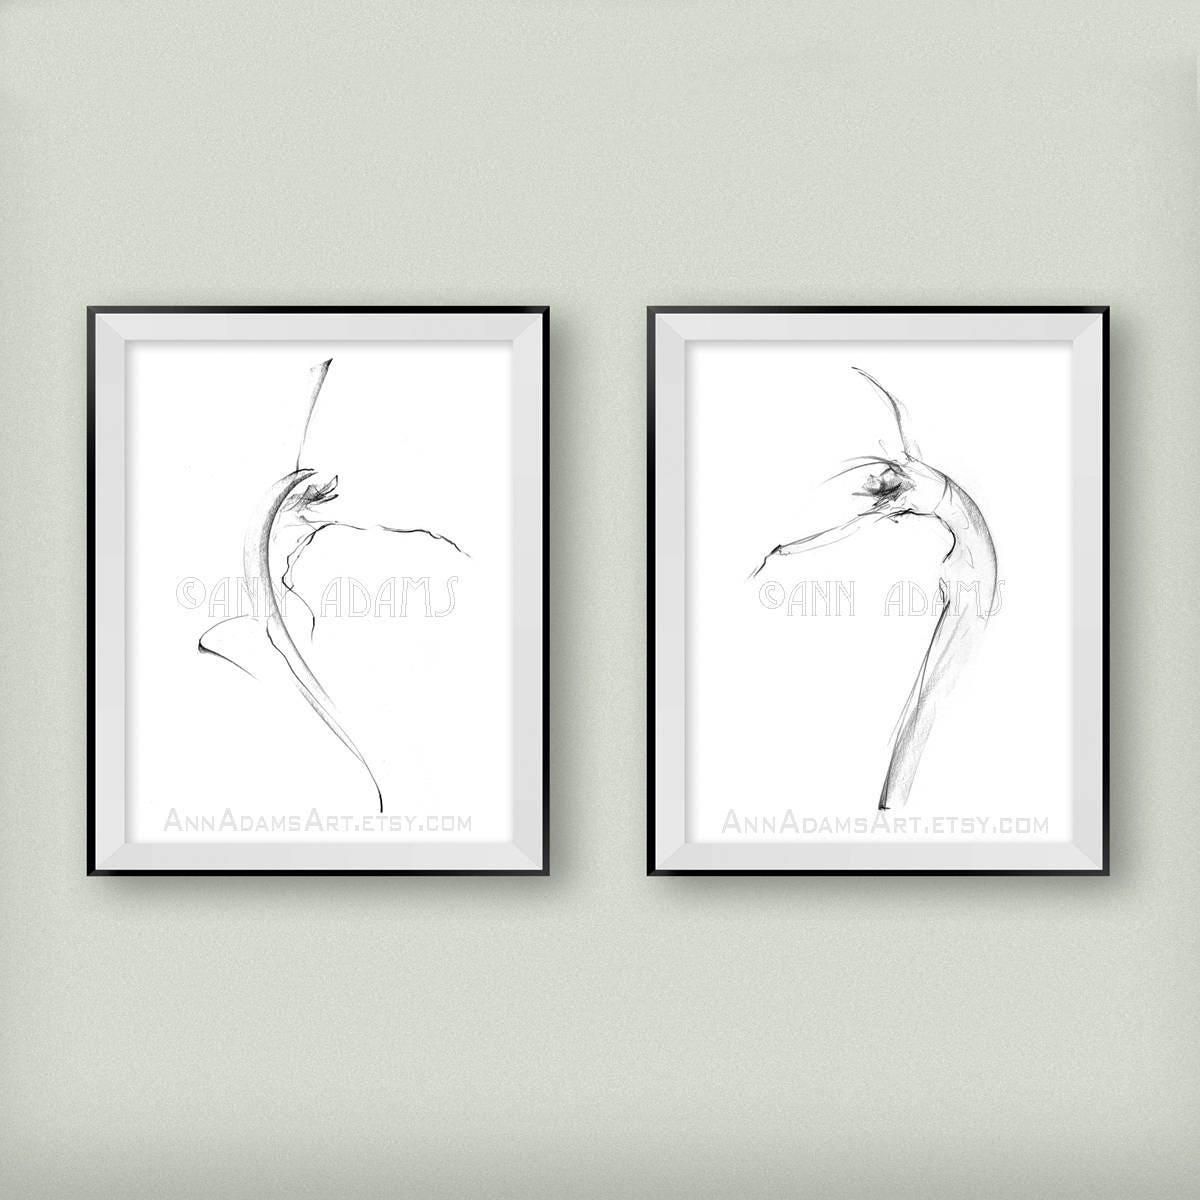 10l 22 minimalist sketch pencil drawing nude art abstract nude figure illustration dance art print from original art by ann adams set of 2